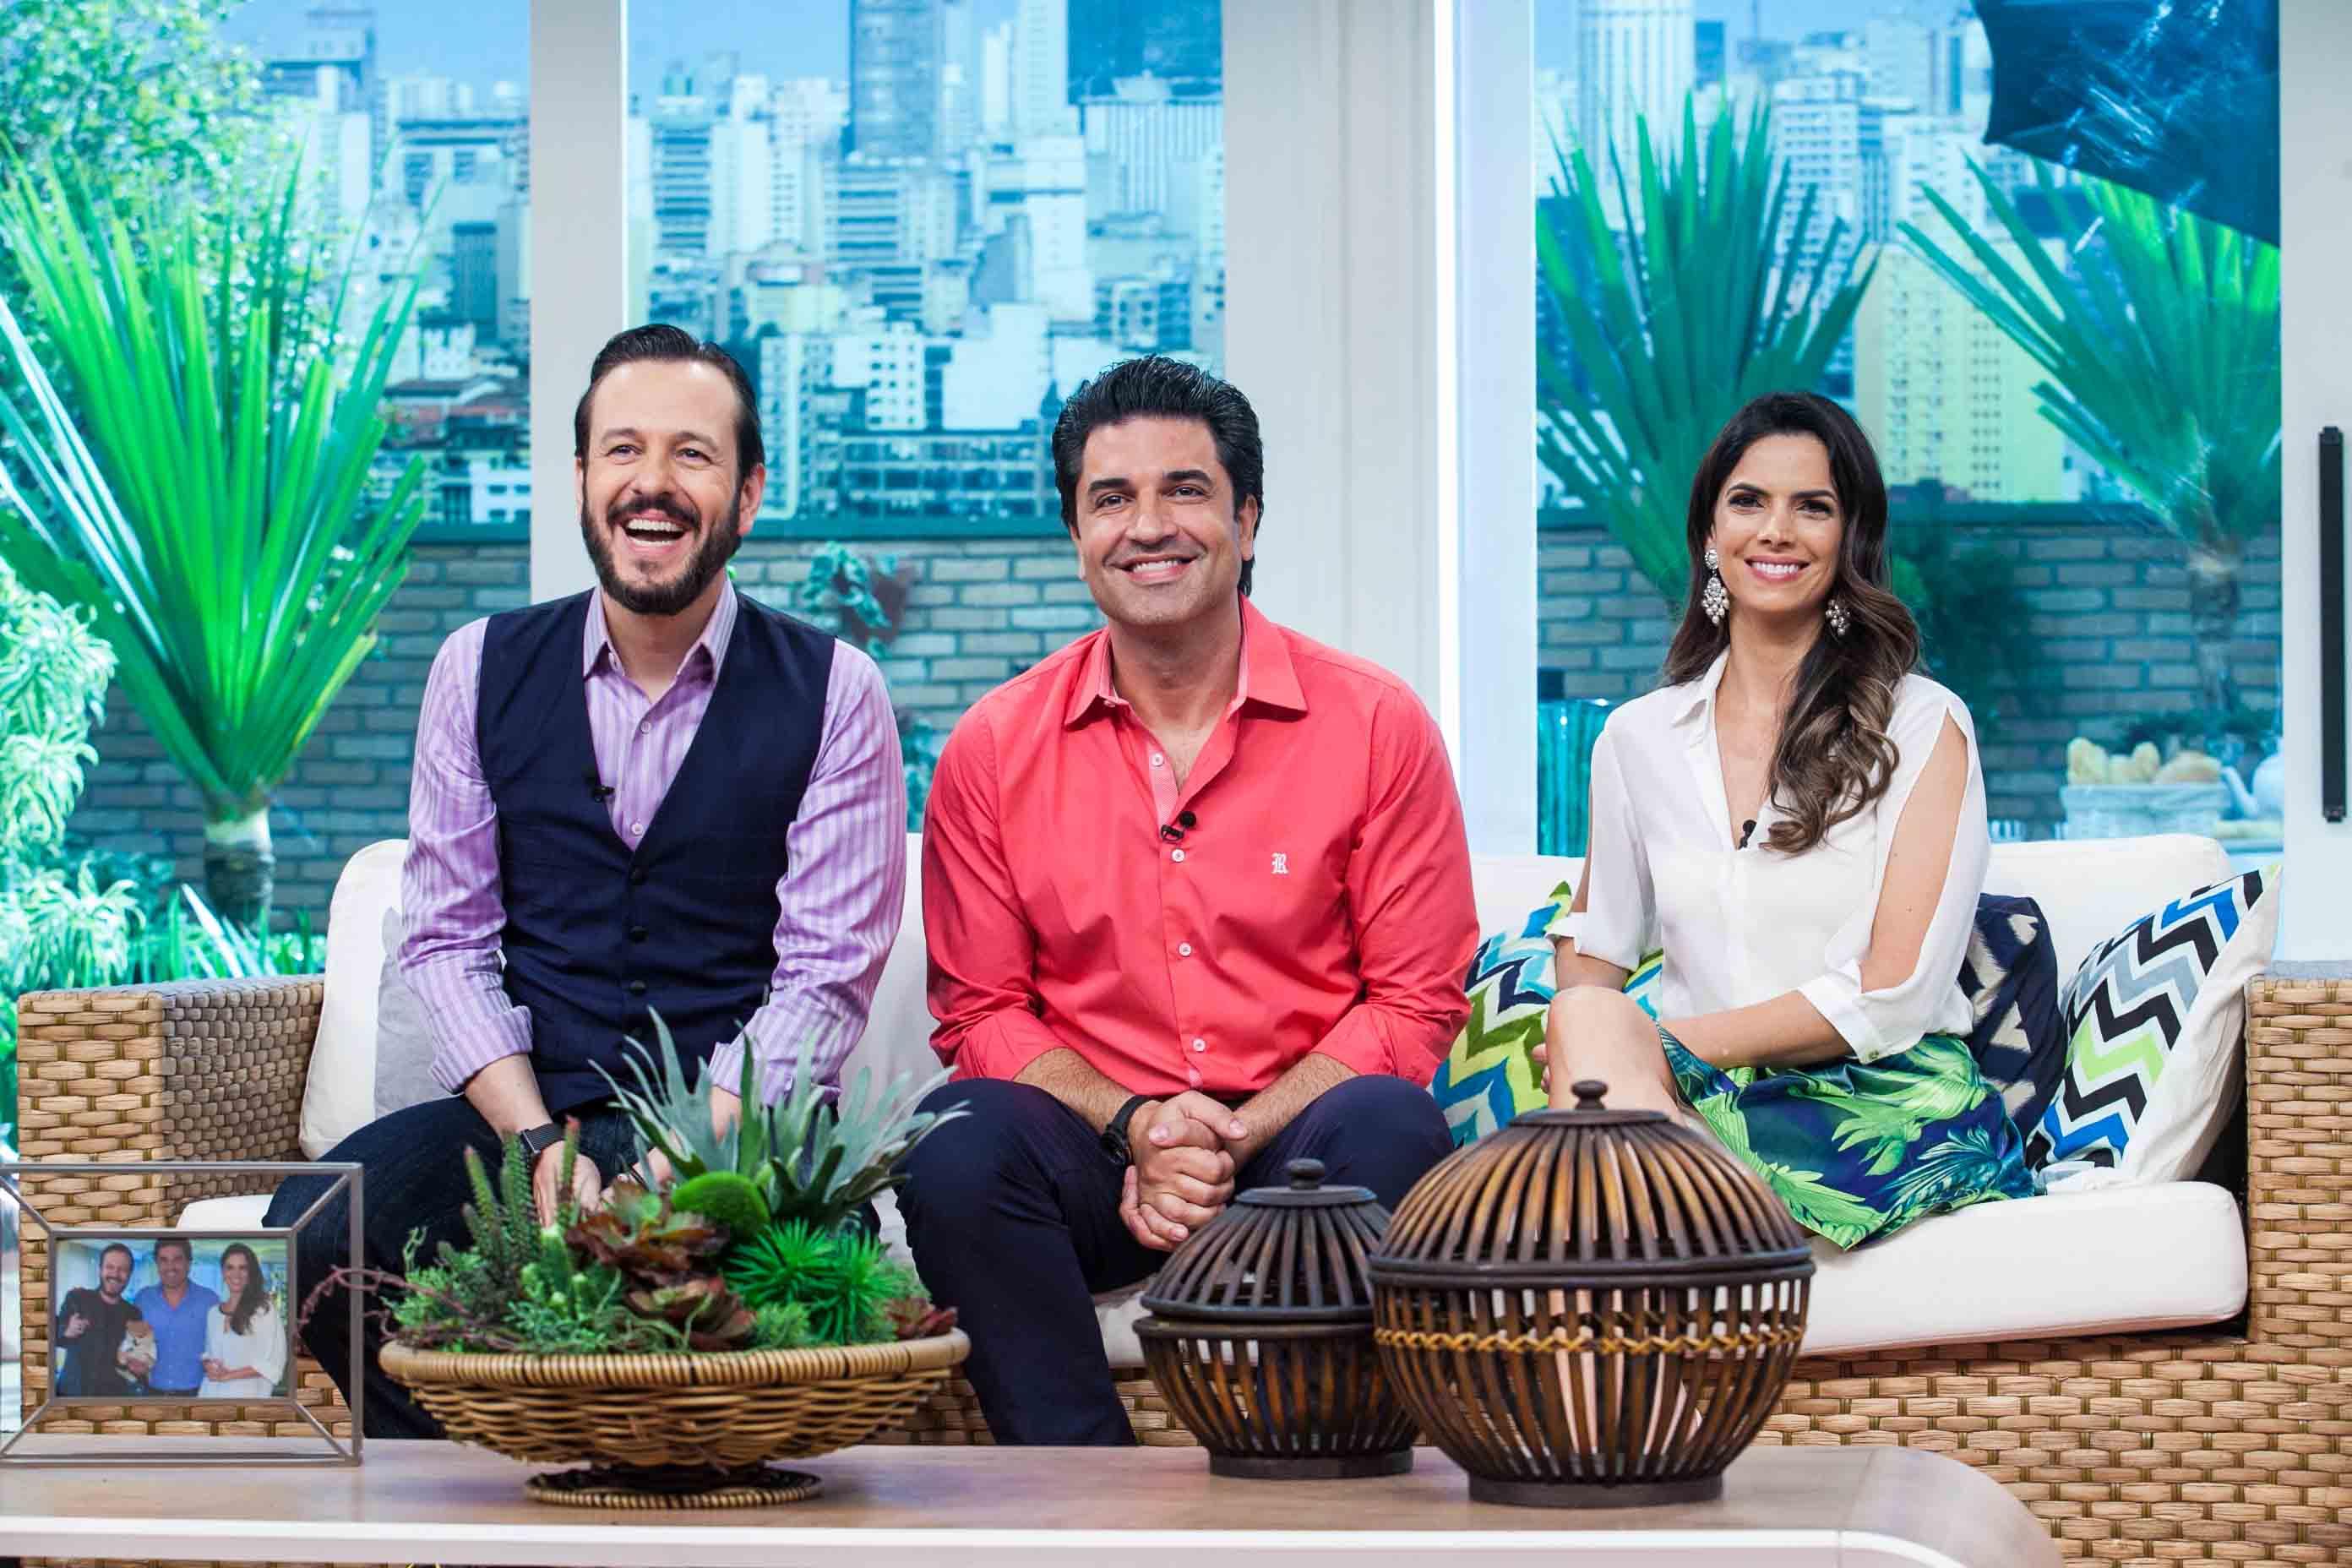 Celso Zucatelli, Edu Guedes e Mariana Leão MPV